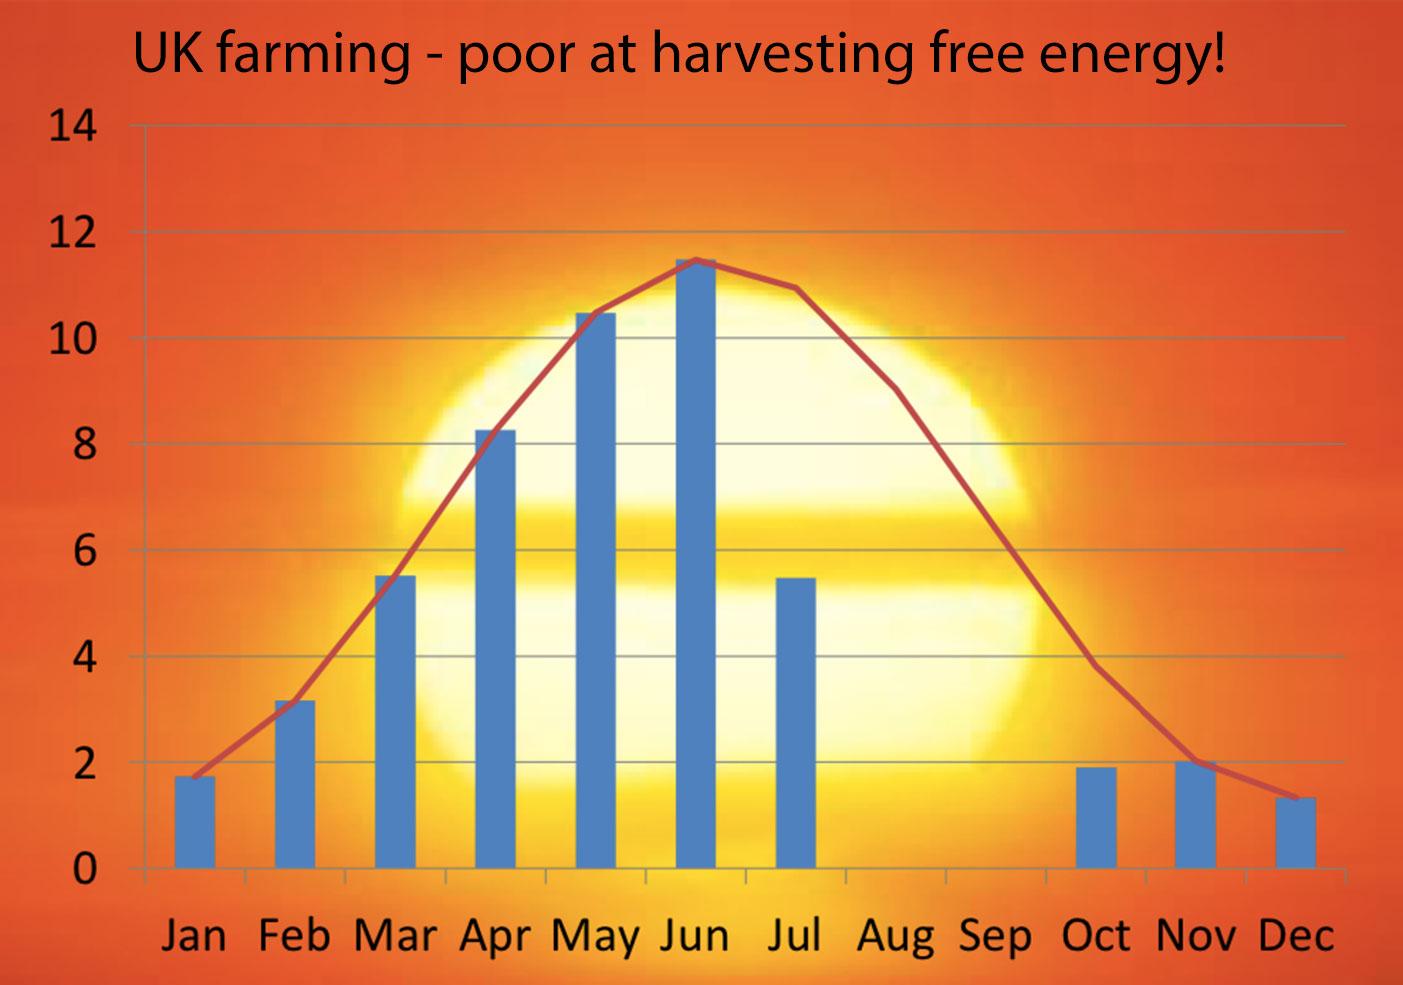 UK farming - poor at harvesting free energy!